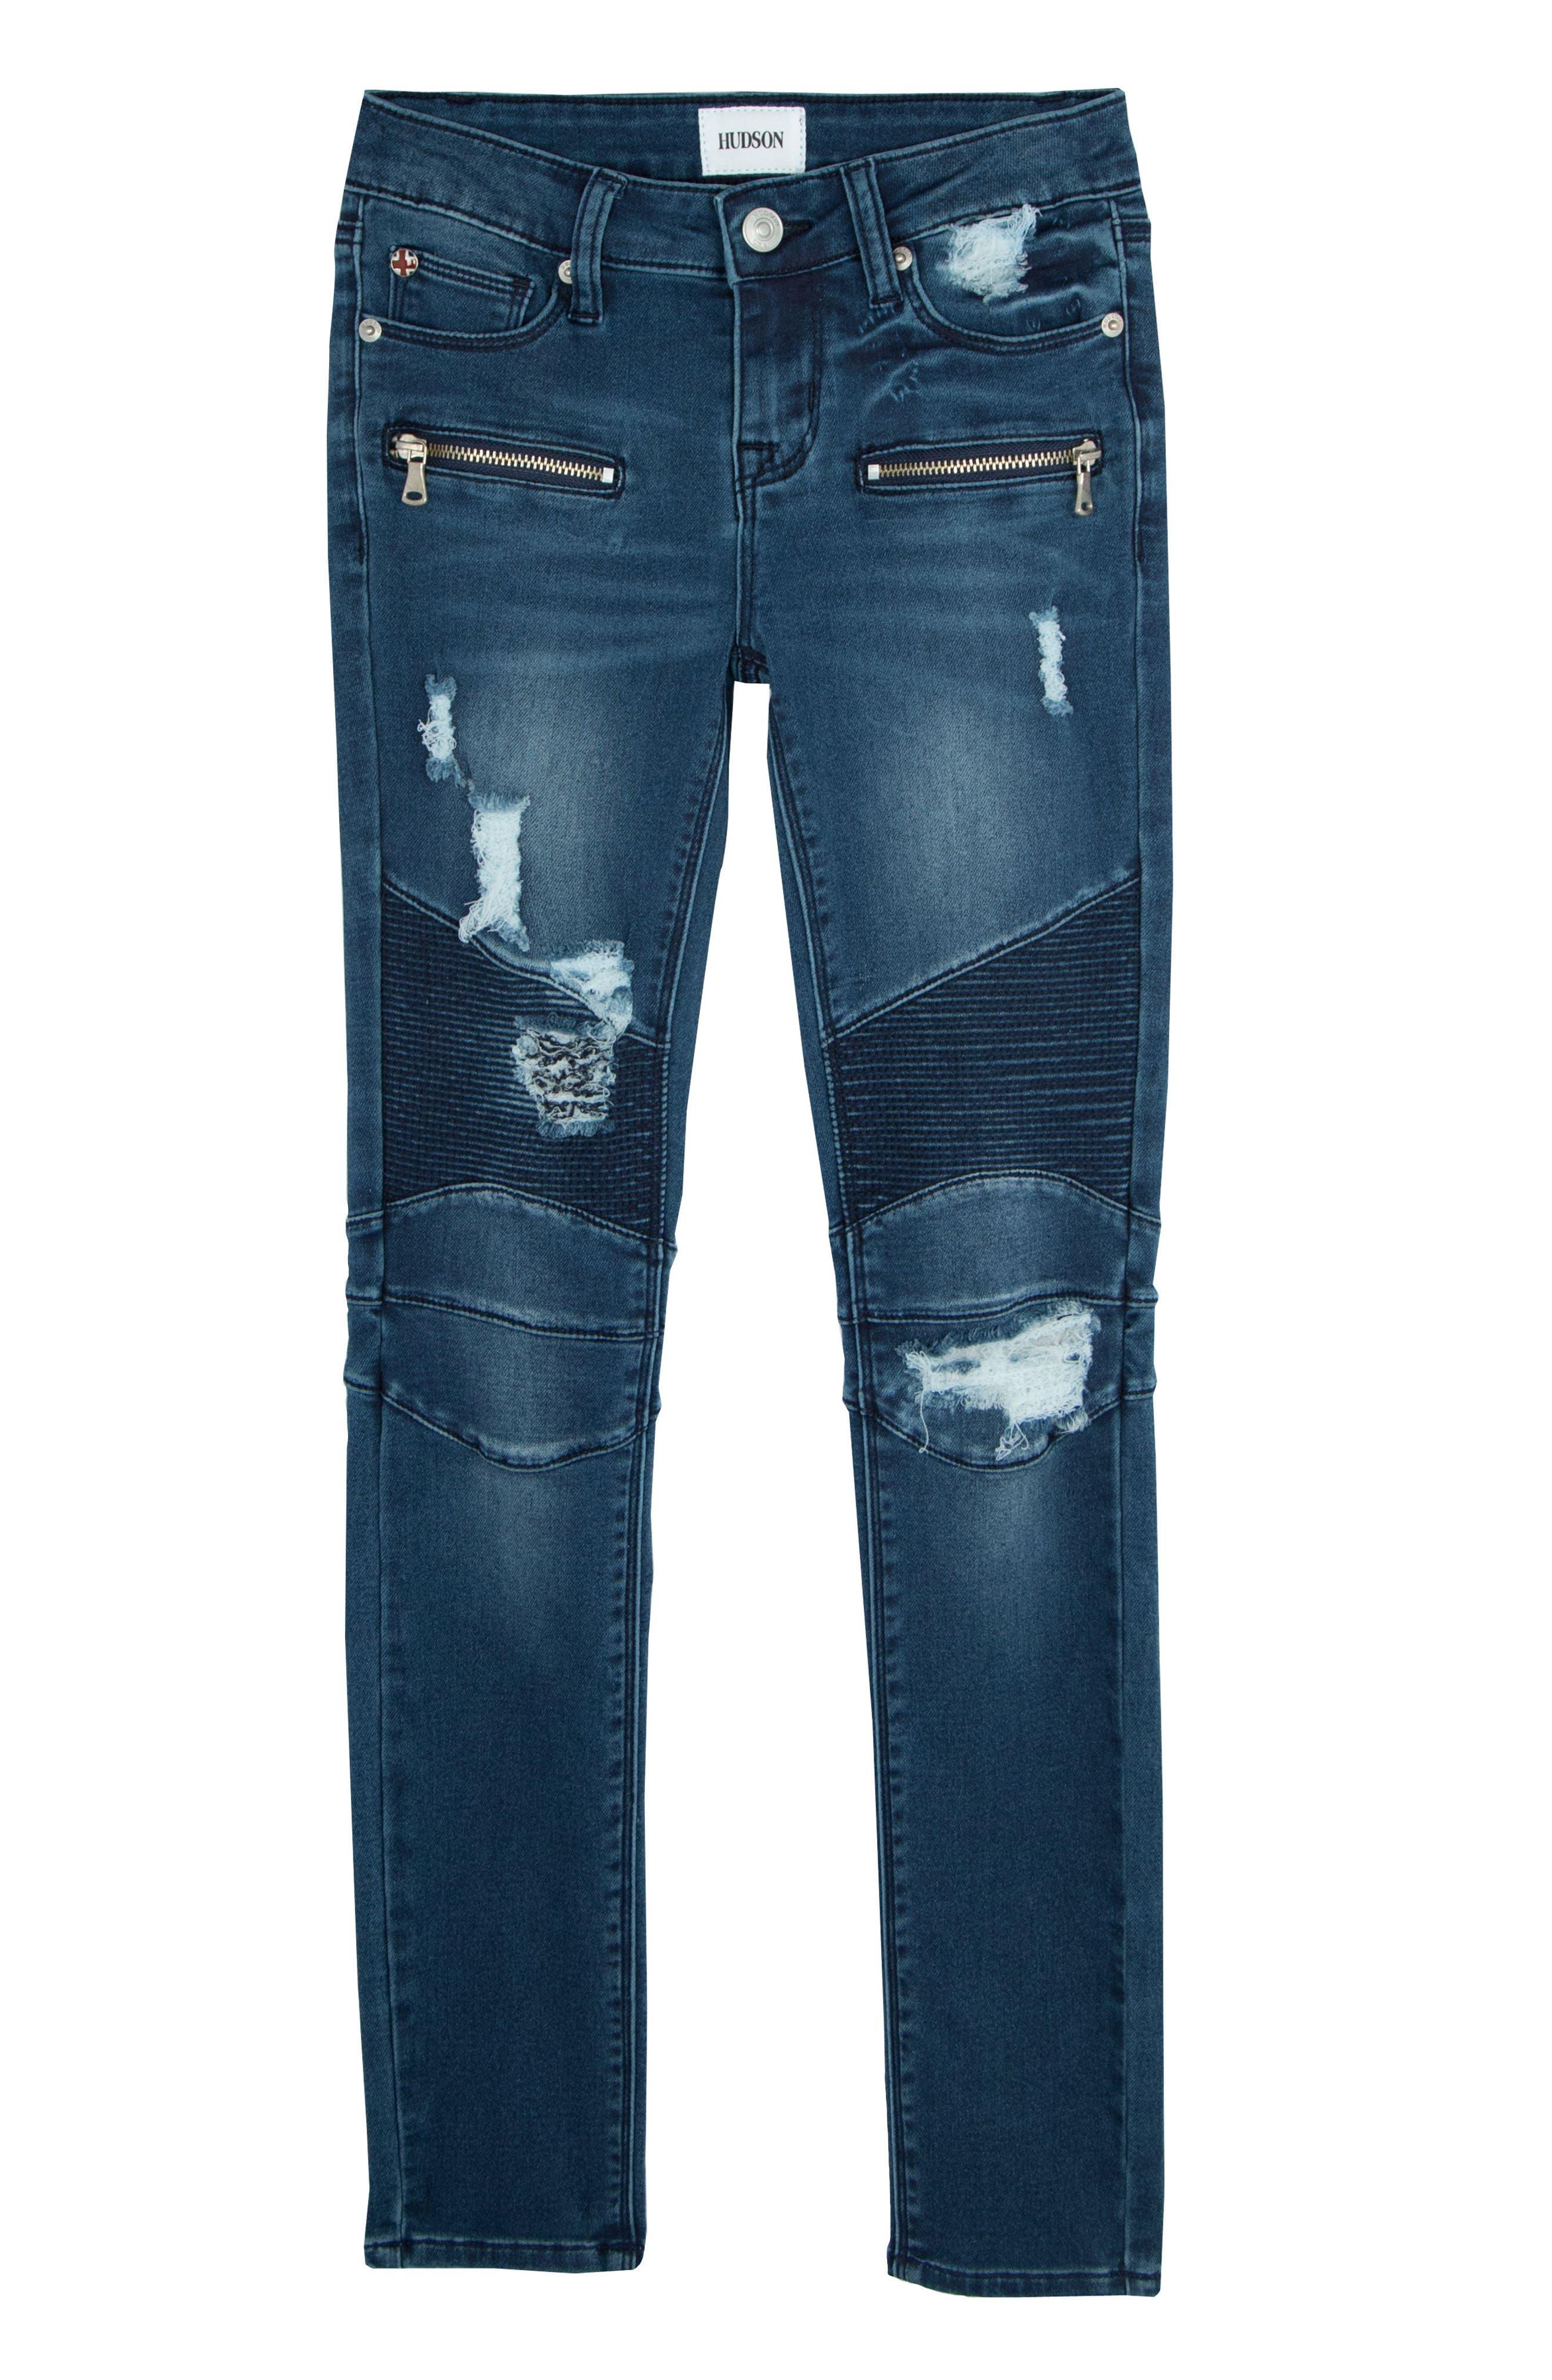 London Distressed Moto Skinny Jeans,                         Main,                         color, 403